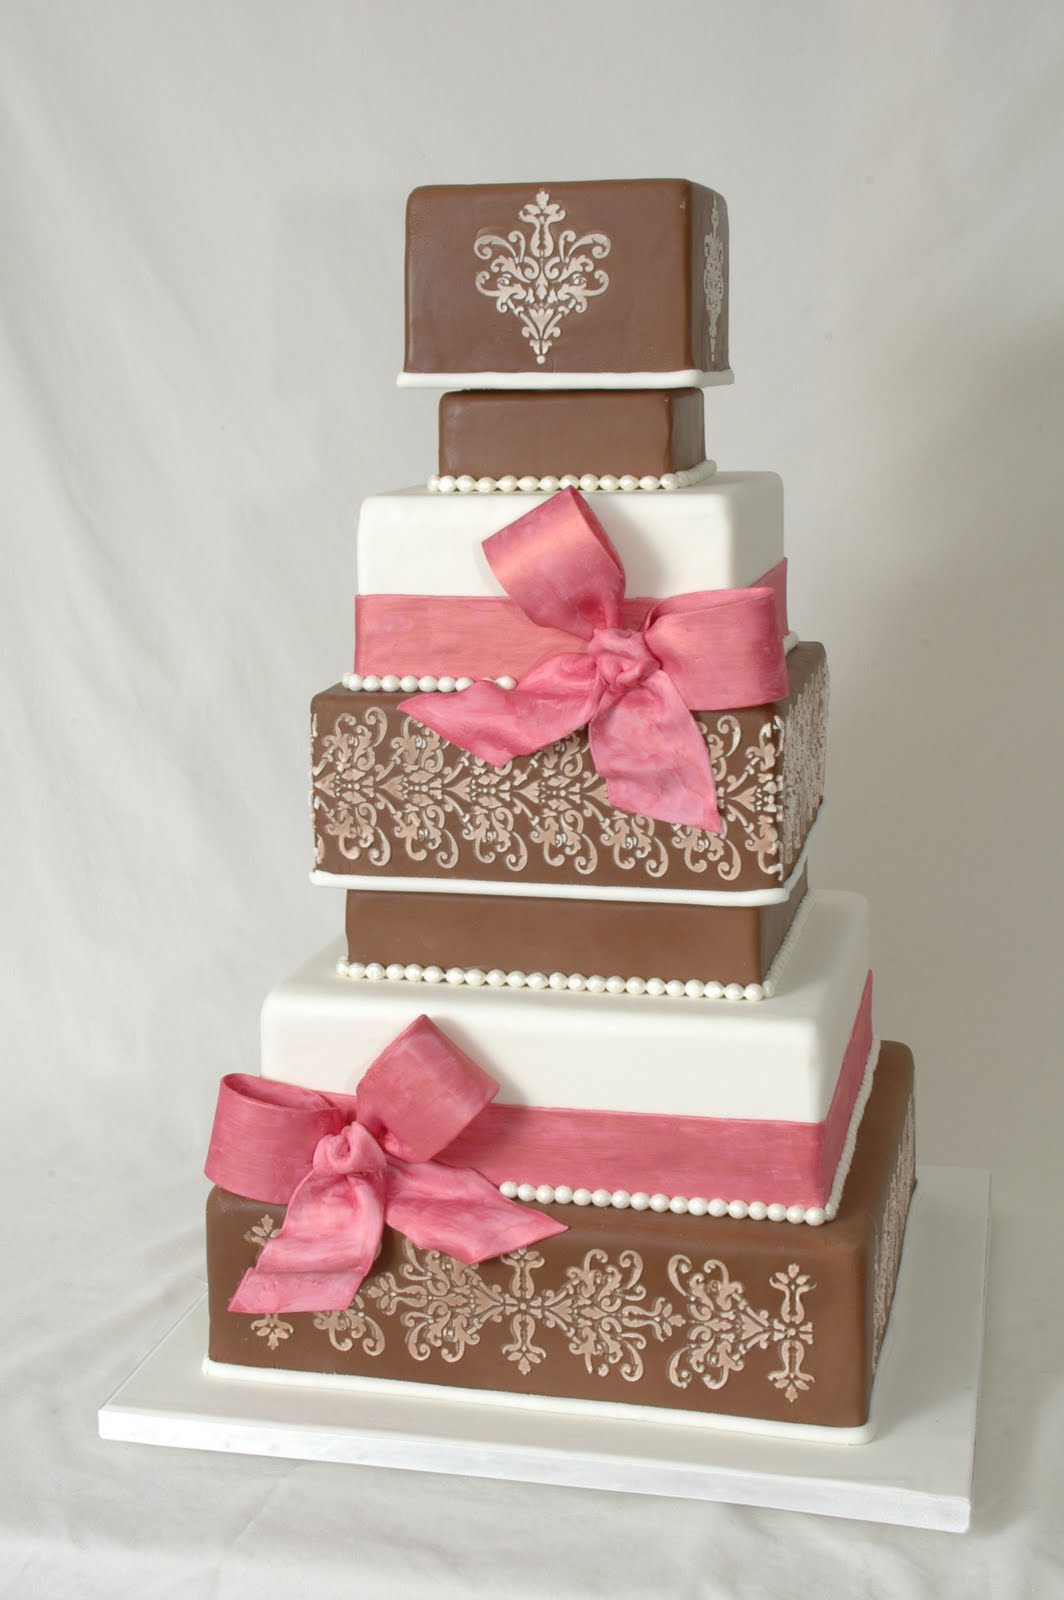 Sweet Eats Cakes: More Wedding Cakes